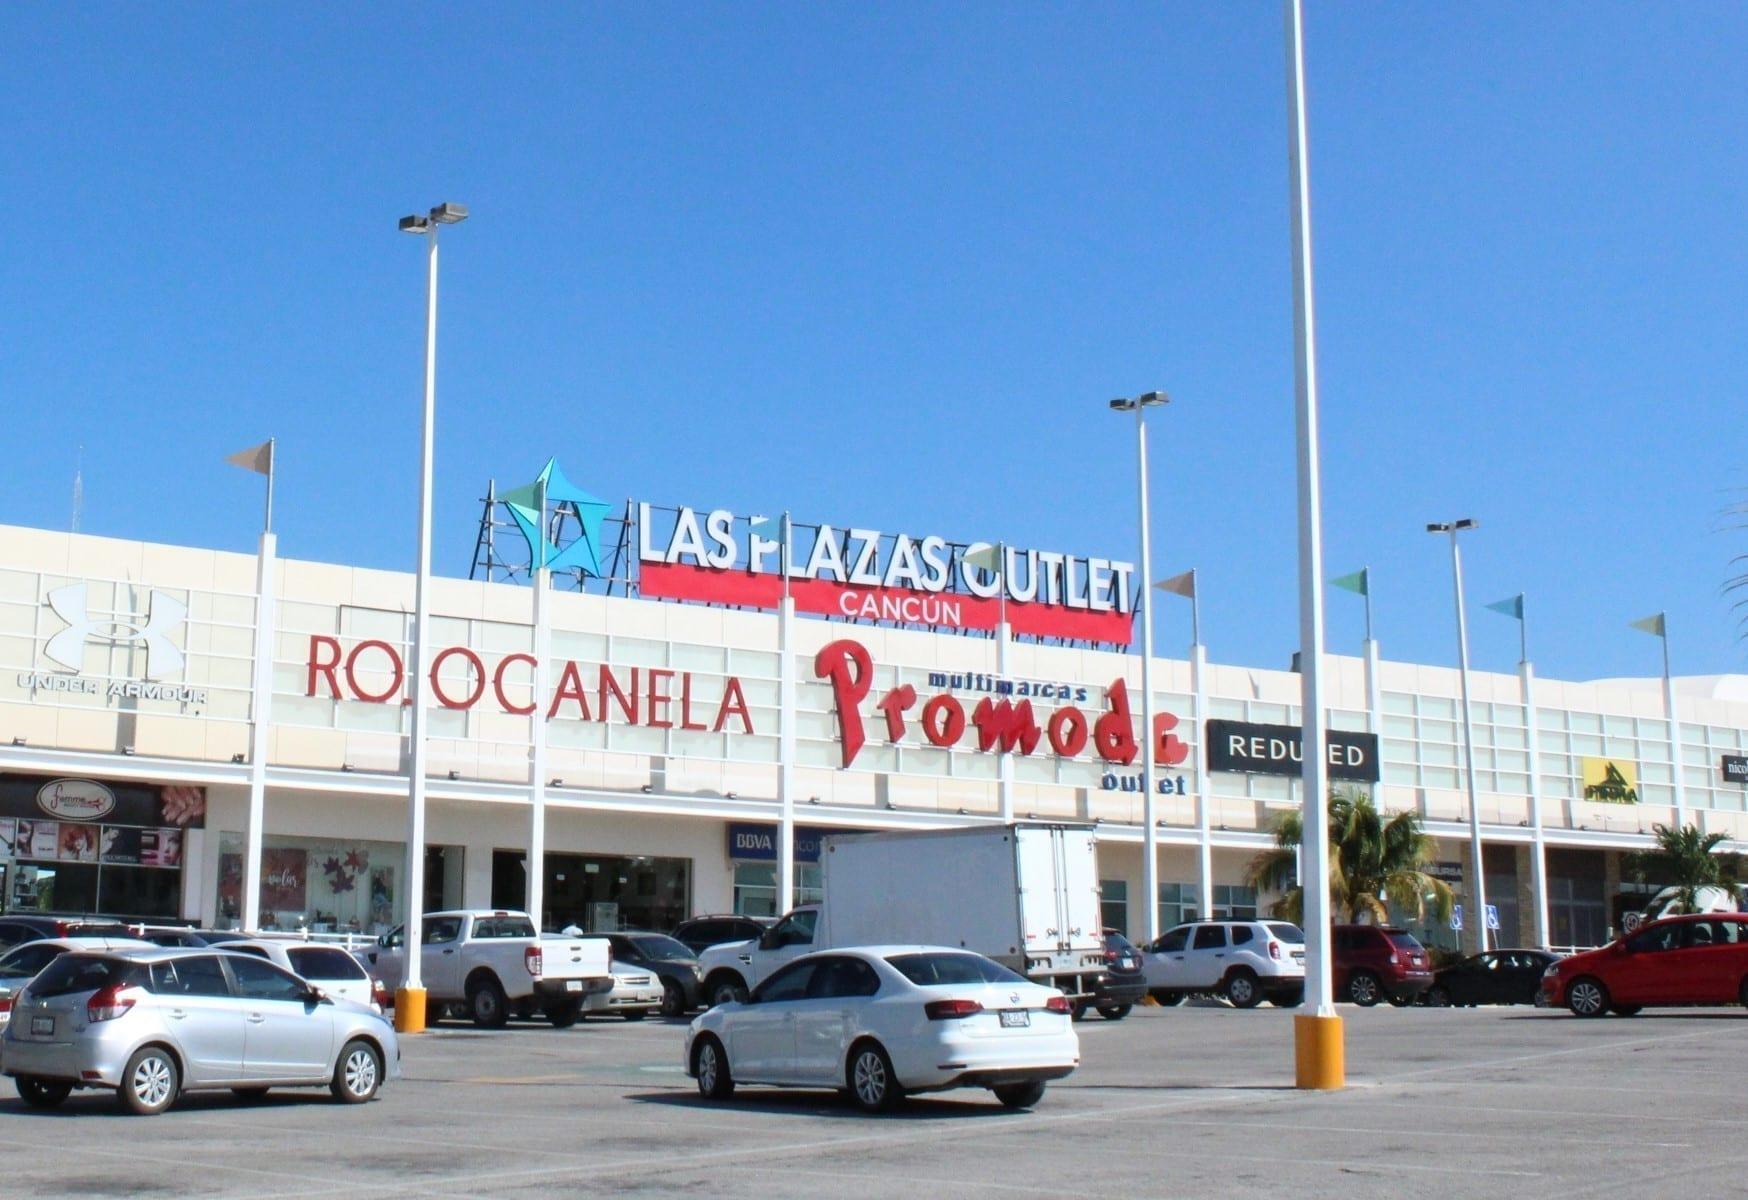 Visitar Las Plazas Outlet Cancún